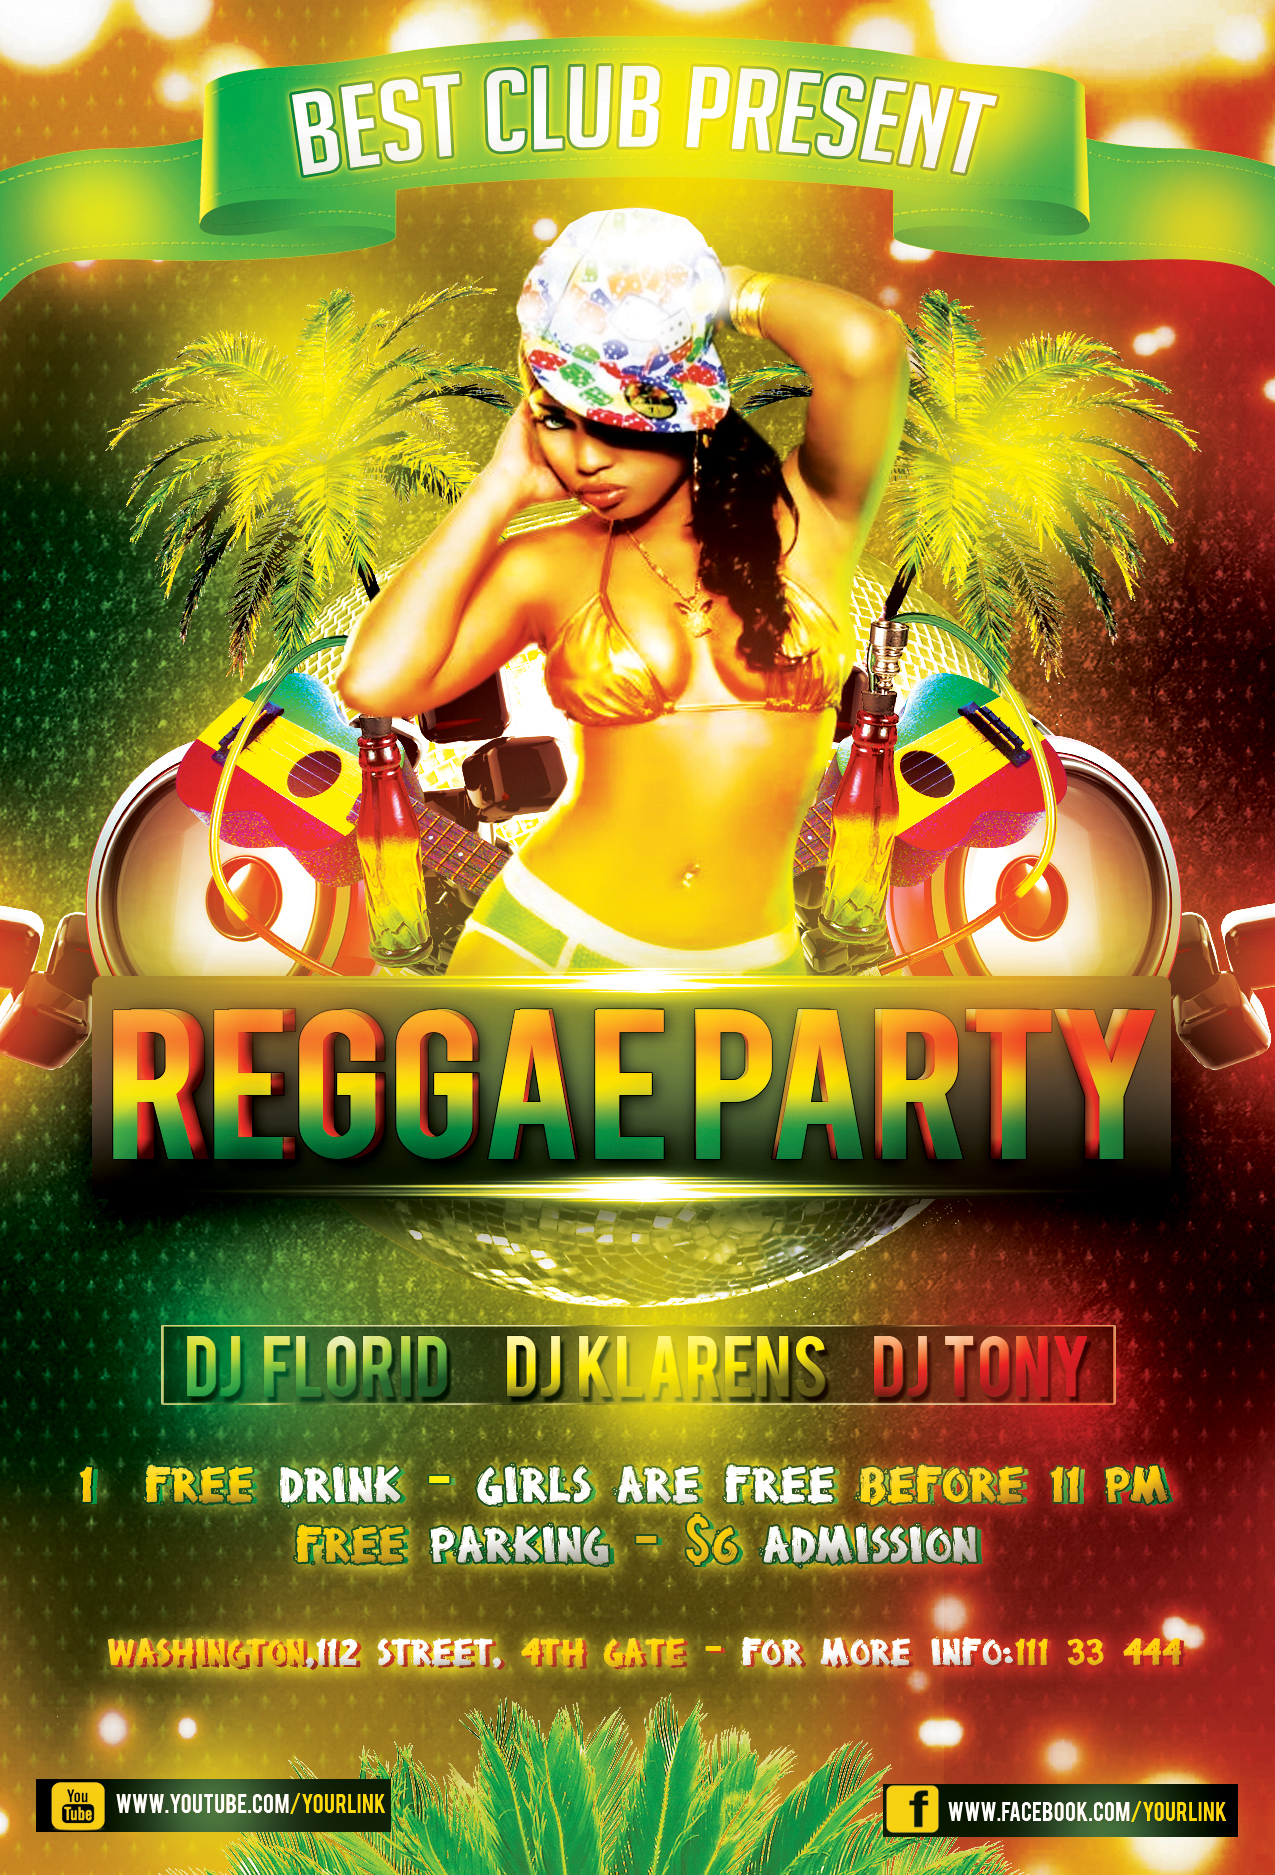 reggae party flyer psd template by klarensm on reggae party flyer psd template by klarensm